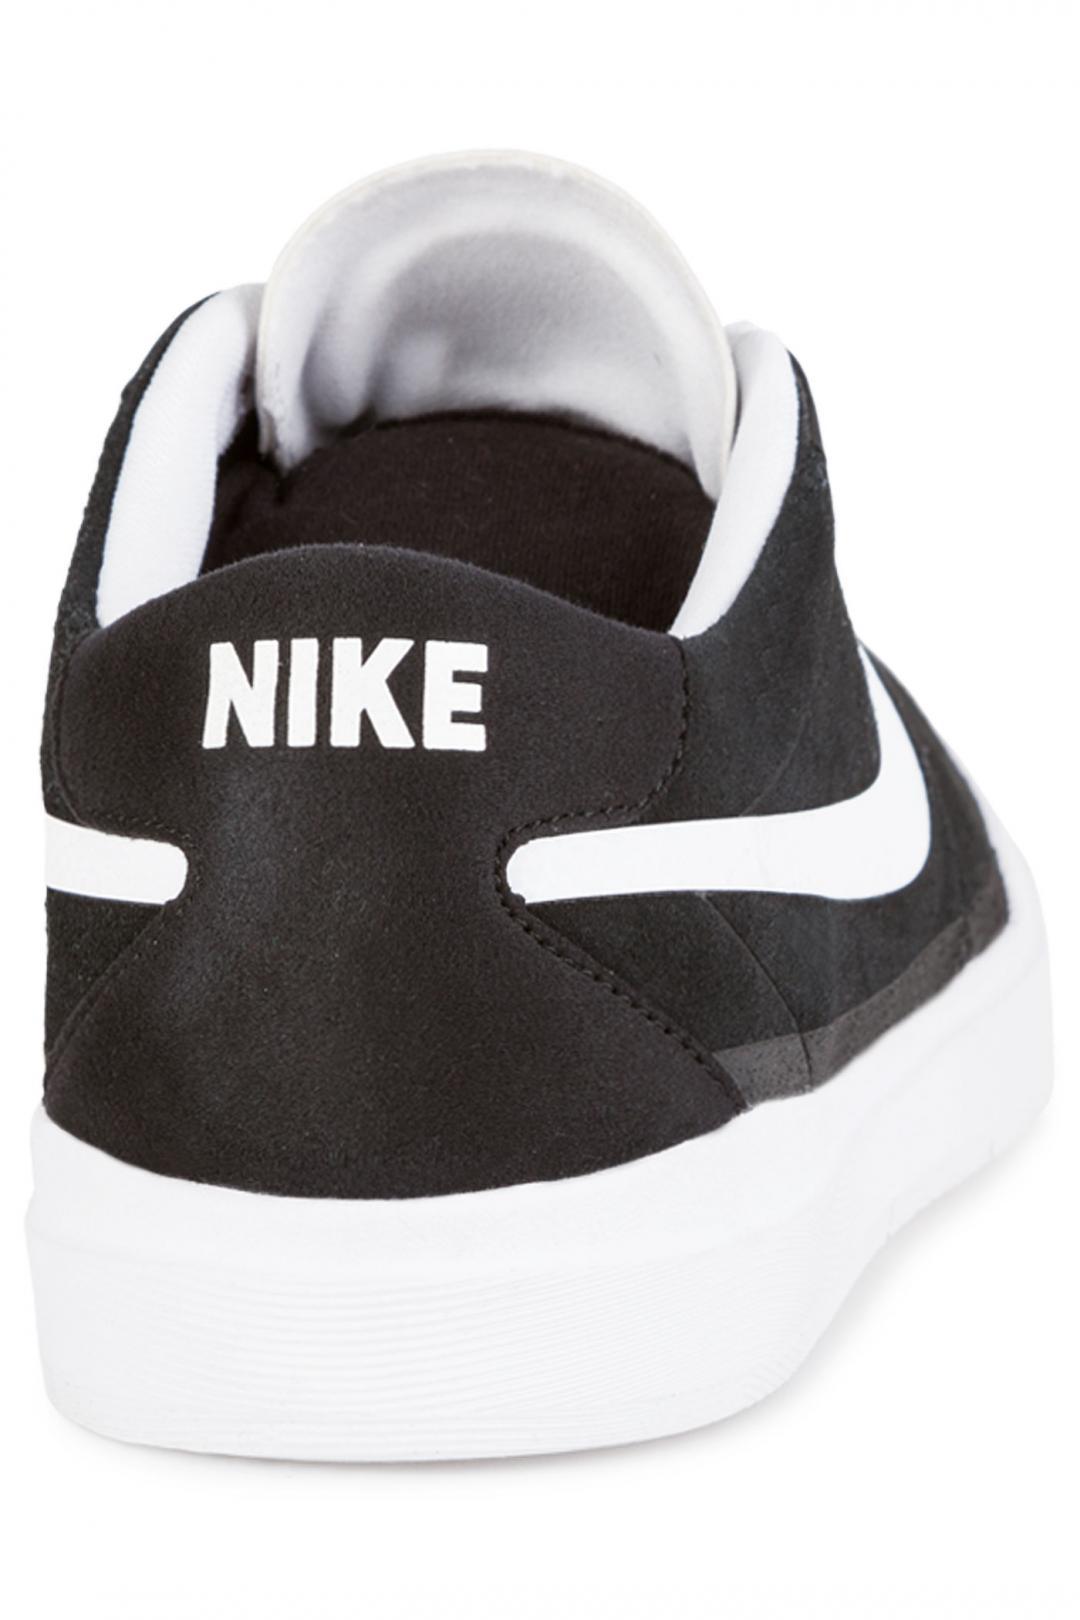 Uomo/Donna Nike SB Bruin Hyperfeel black white | Sneakers low top